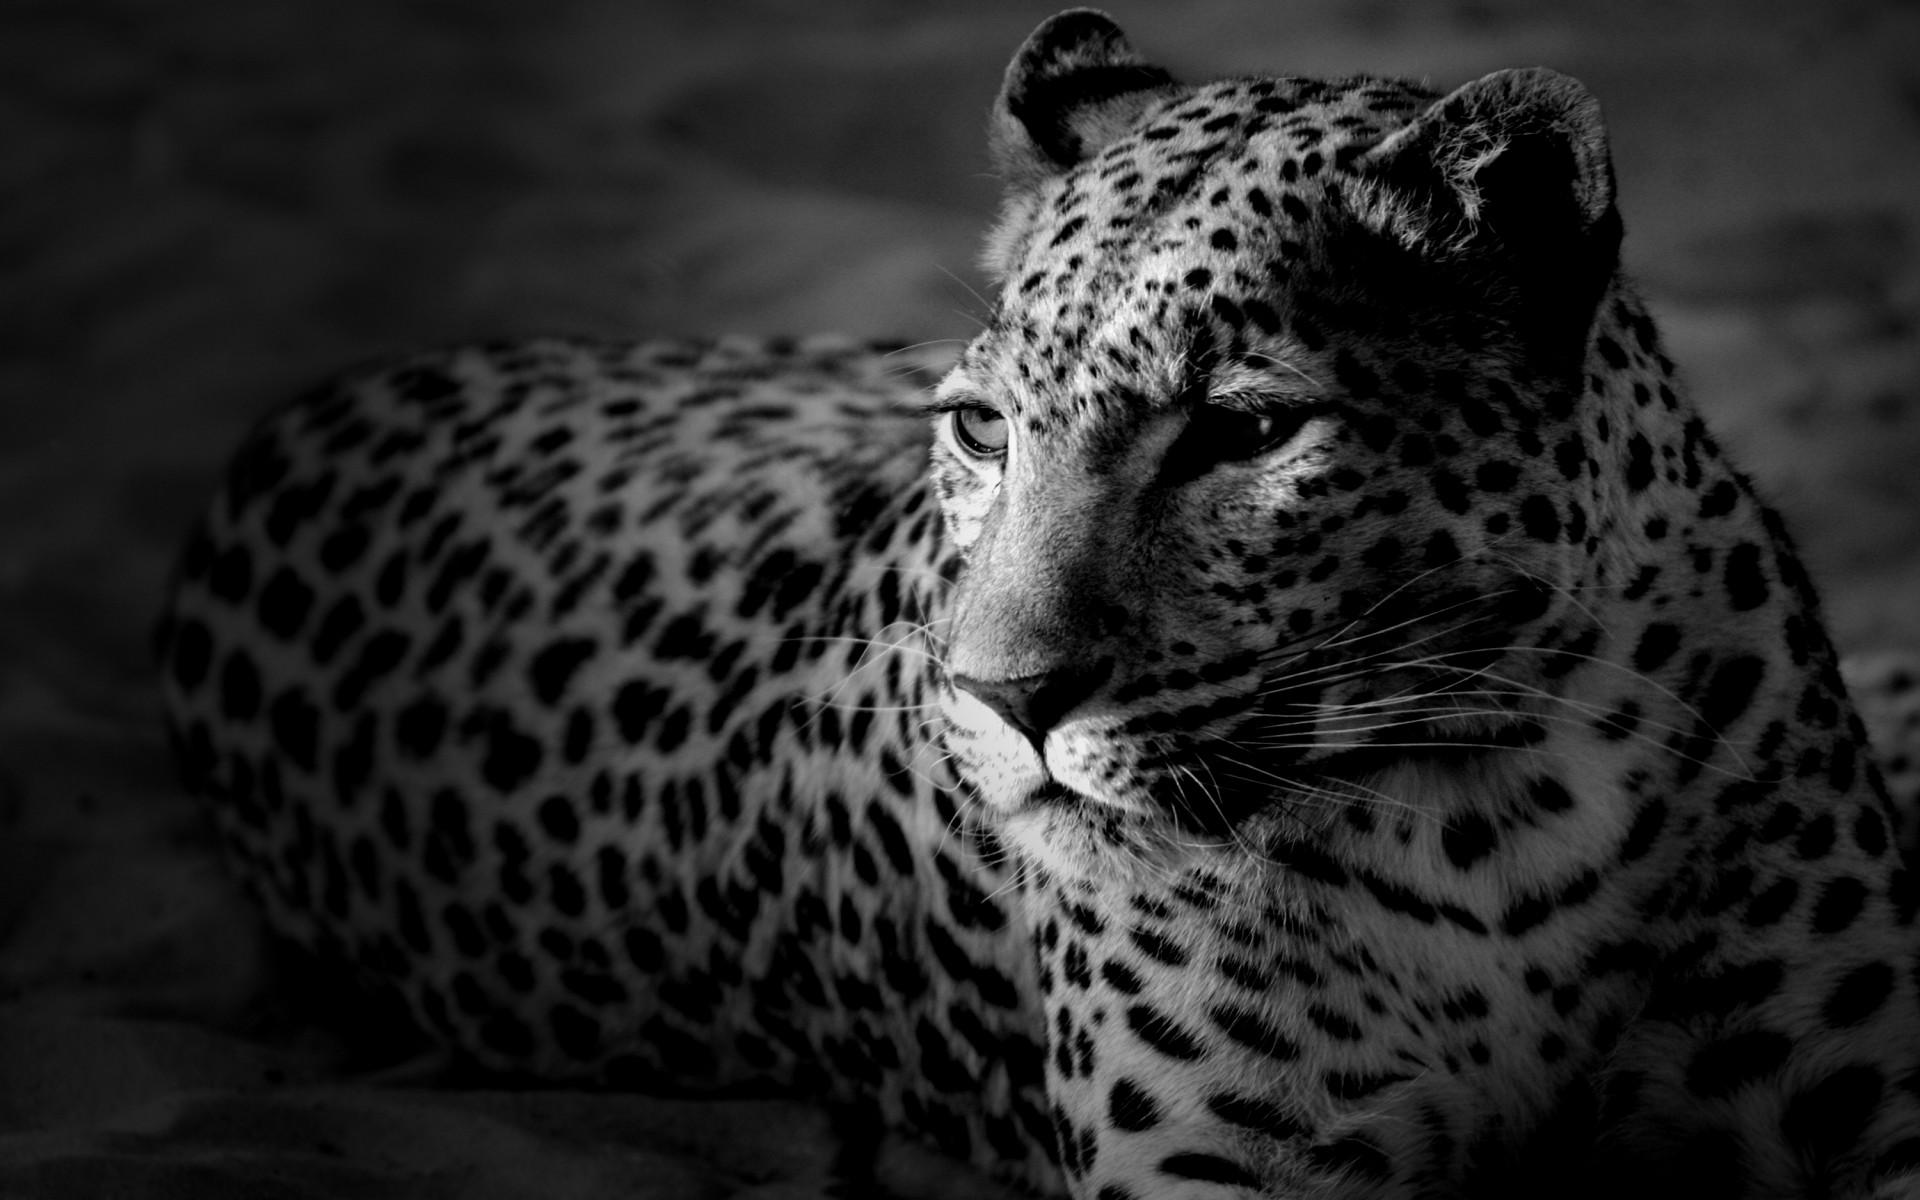 Leopard Wallpaper 78 Pictures